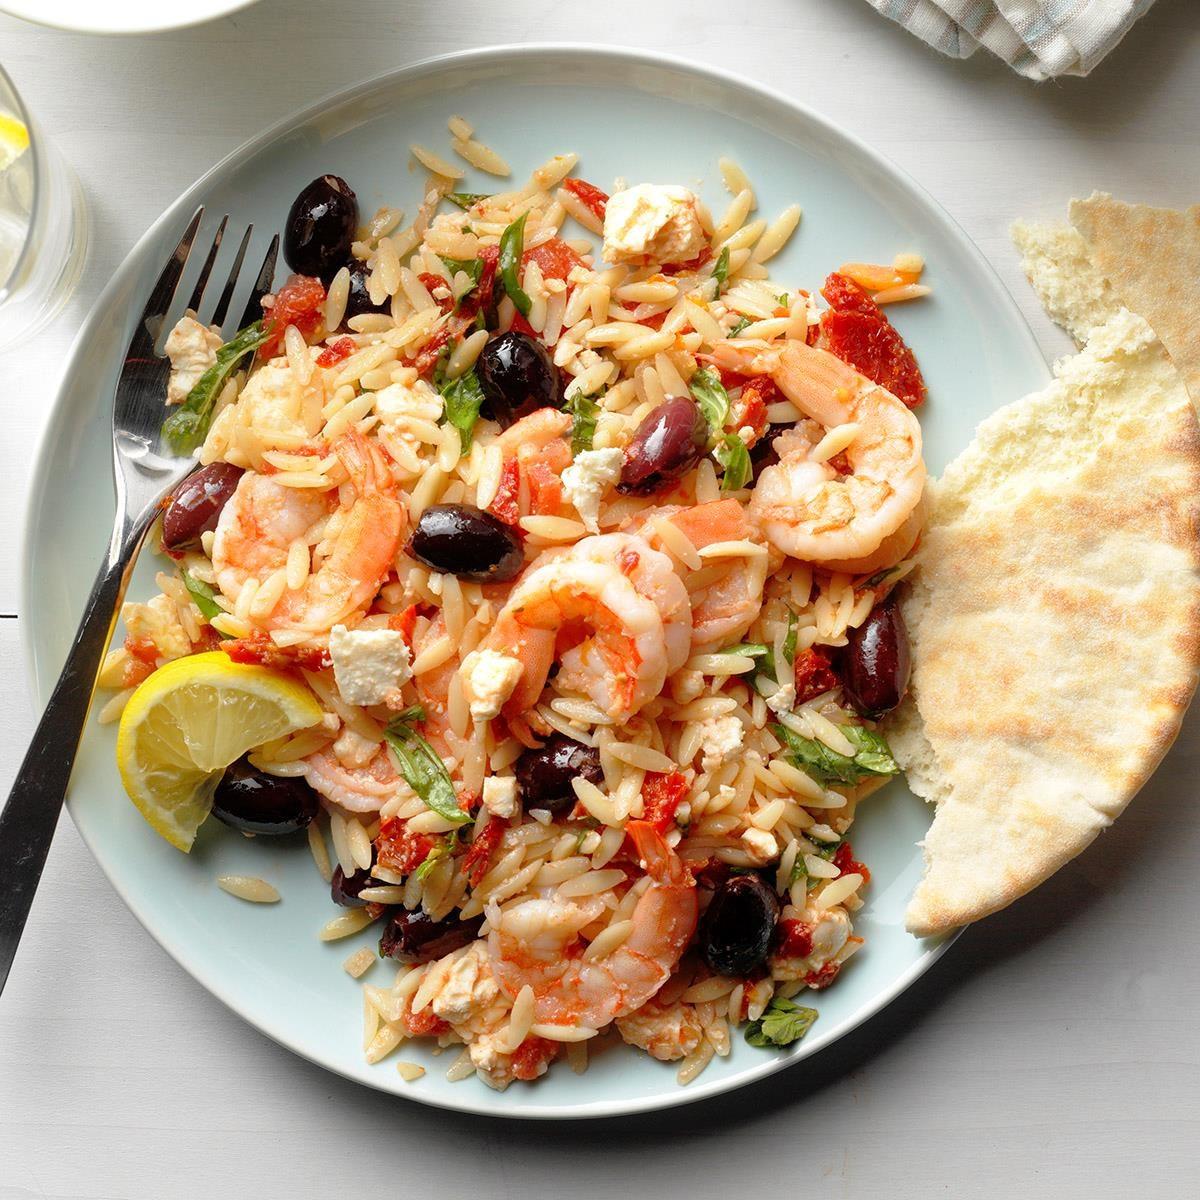 Day 1: Greek Shrimp Orzo